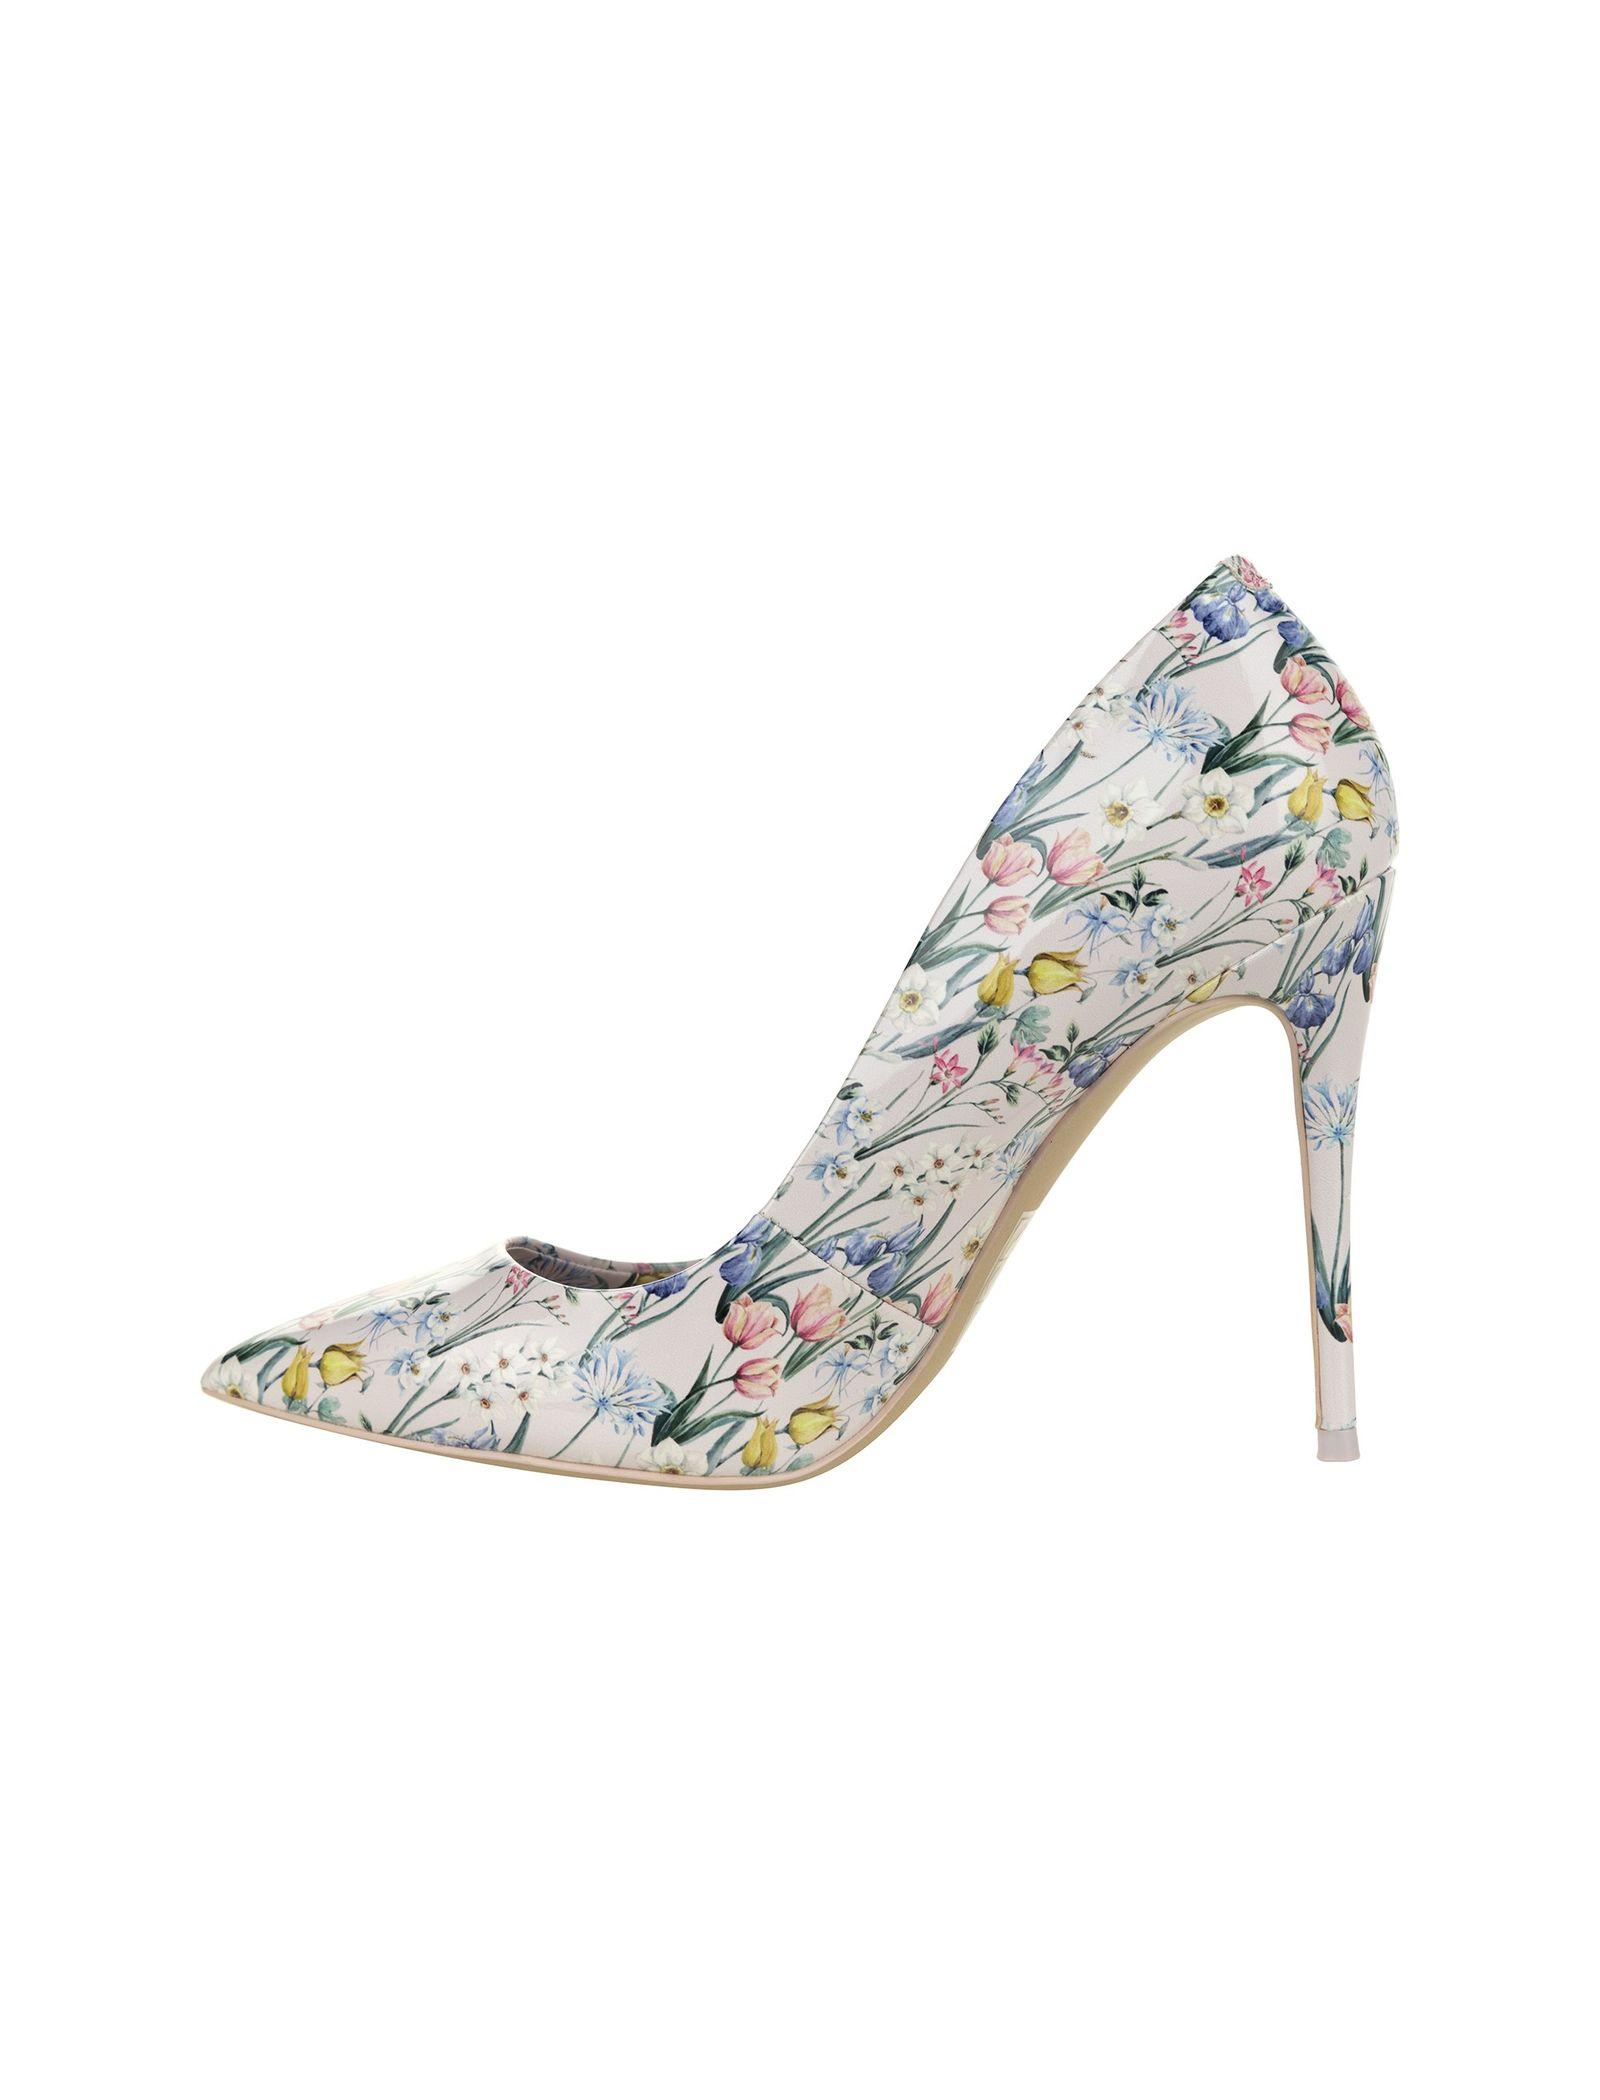 کفش پاشنه بلند زنانه - آلدو - صورتي  - 3